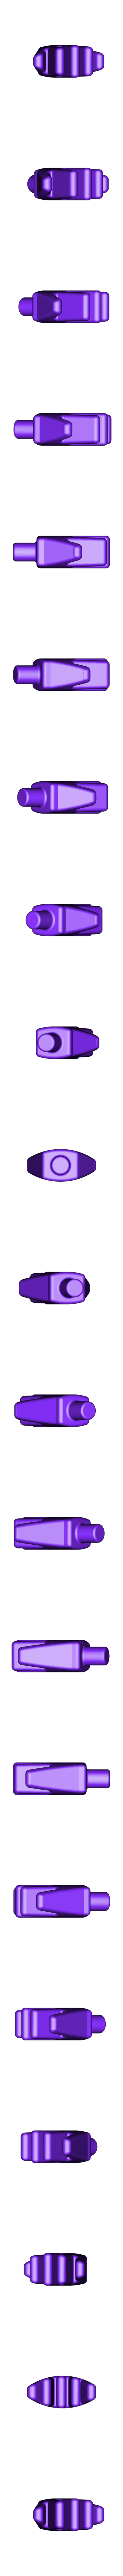 Bens_Hand.STL Download free STL file Automata-4 Ben rides around the clock • 3D printer template, woodenclocks